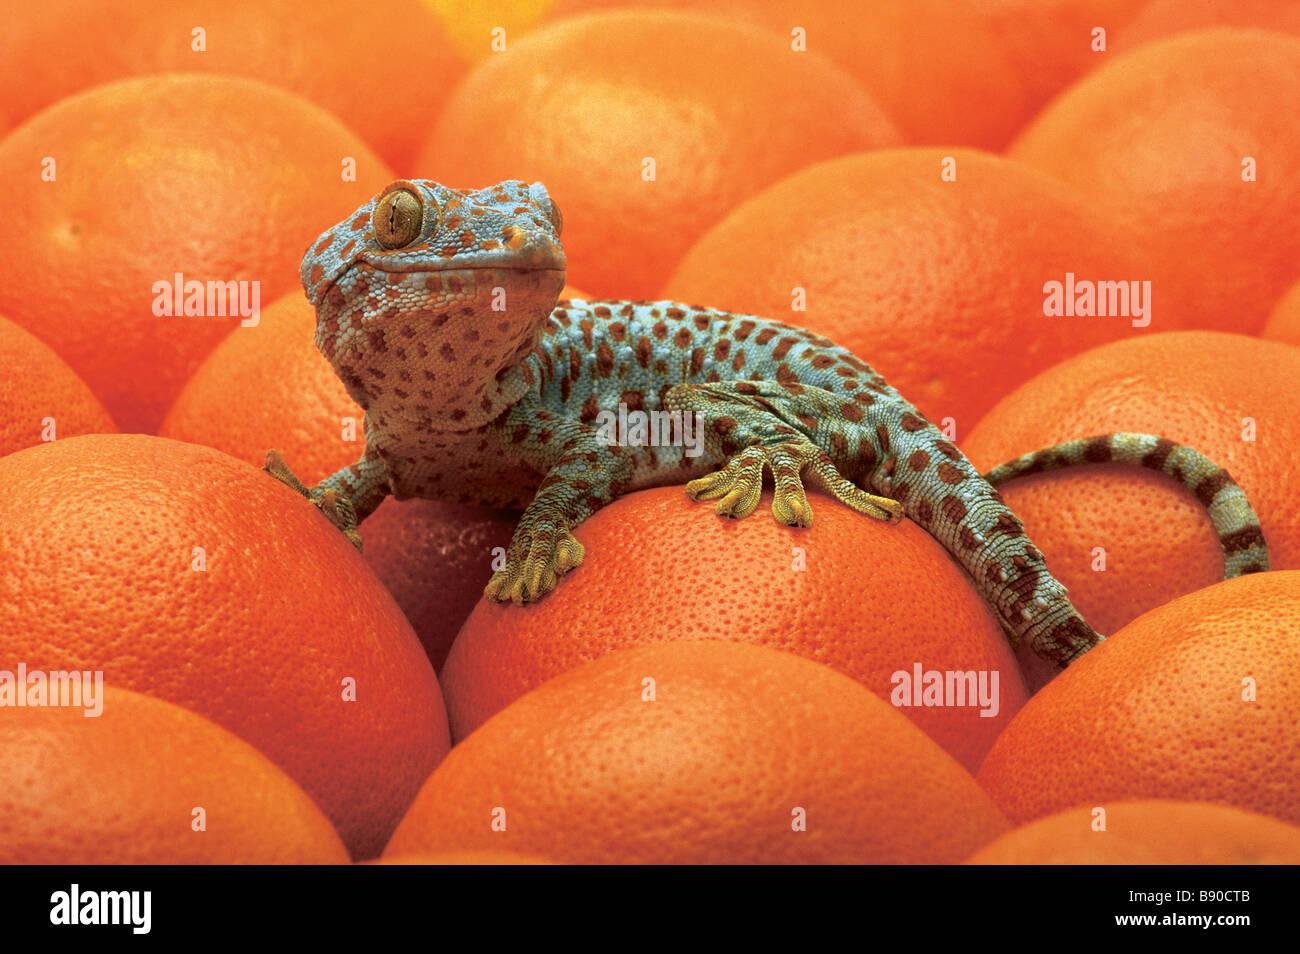 FL1179, Kitchin/Hurst; lagarto moteado naranjas Imagen De Stock